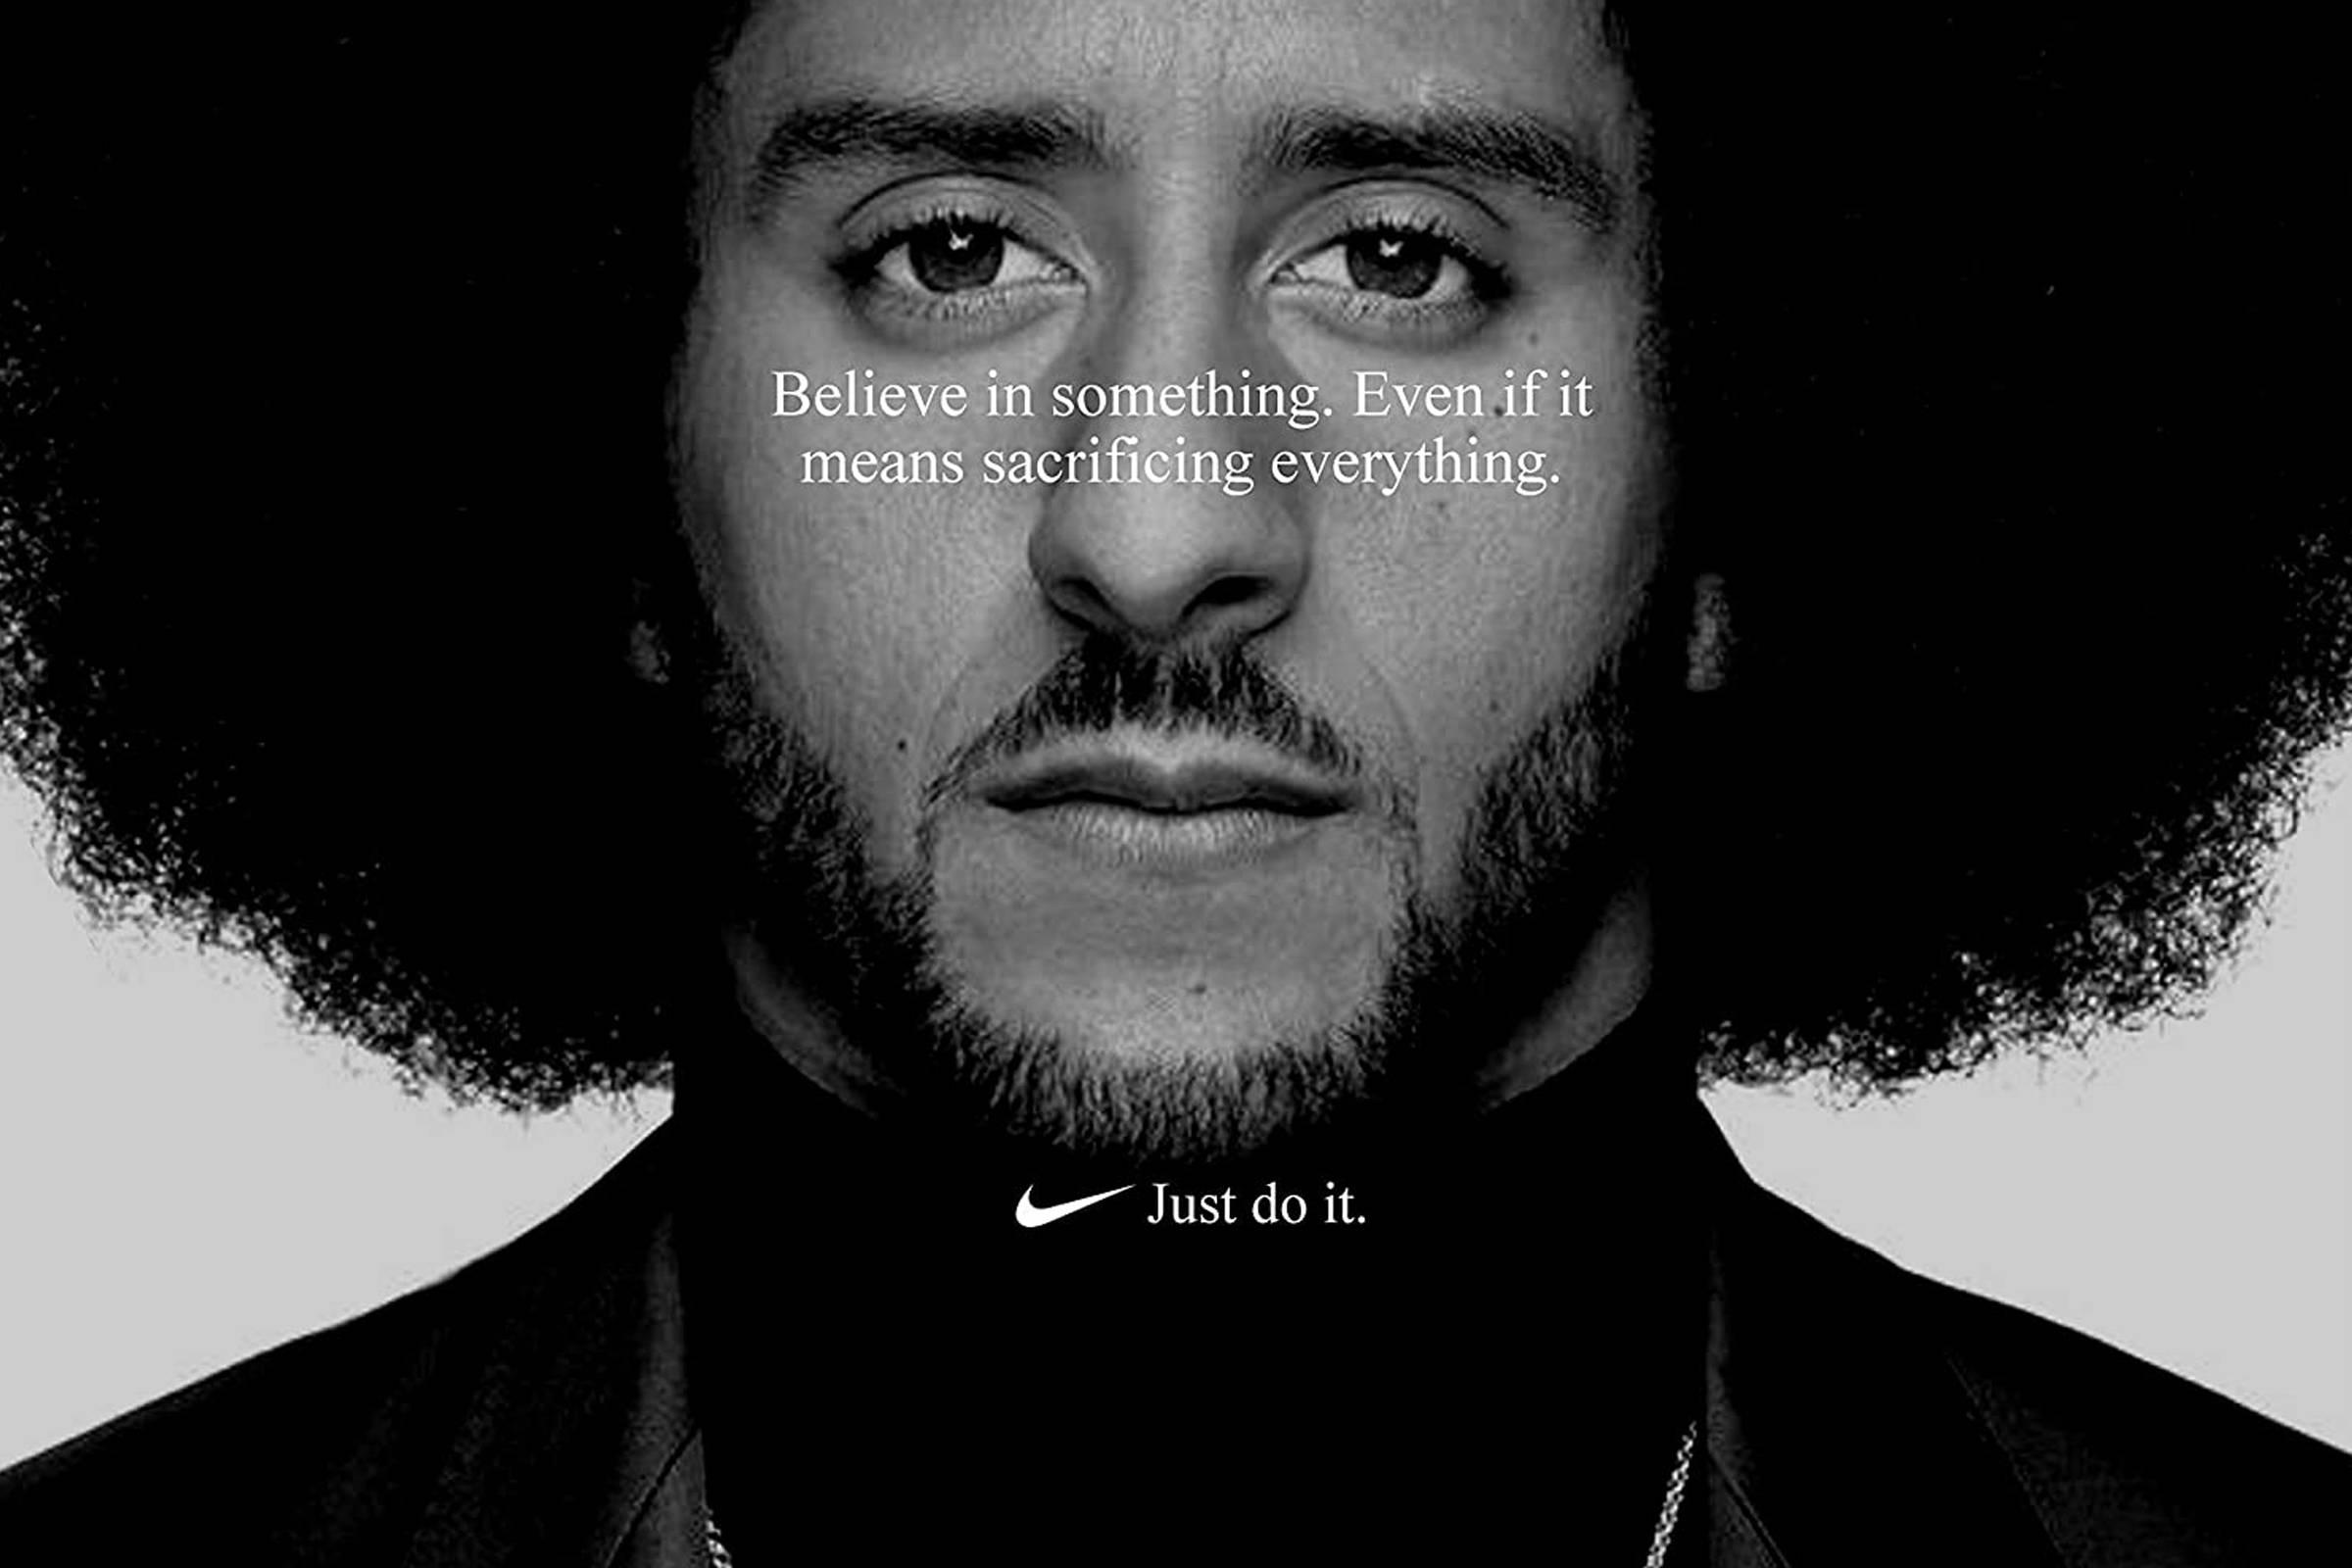 Nike: Is Supporting Kaepernick Enough?